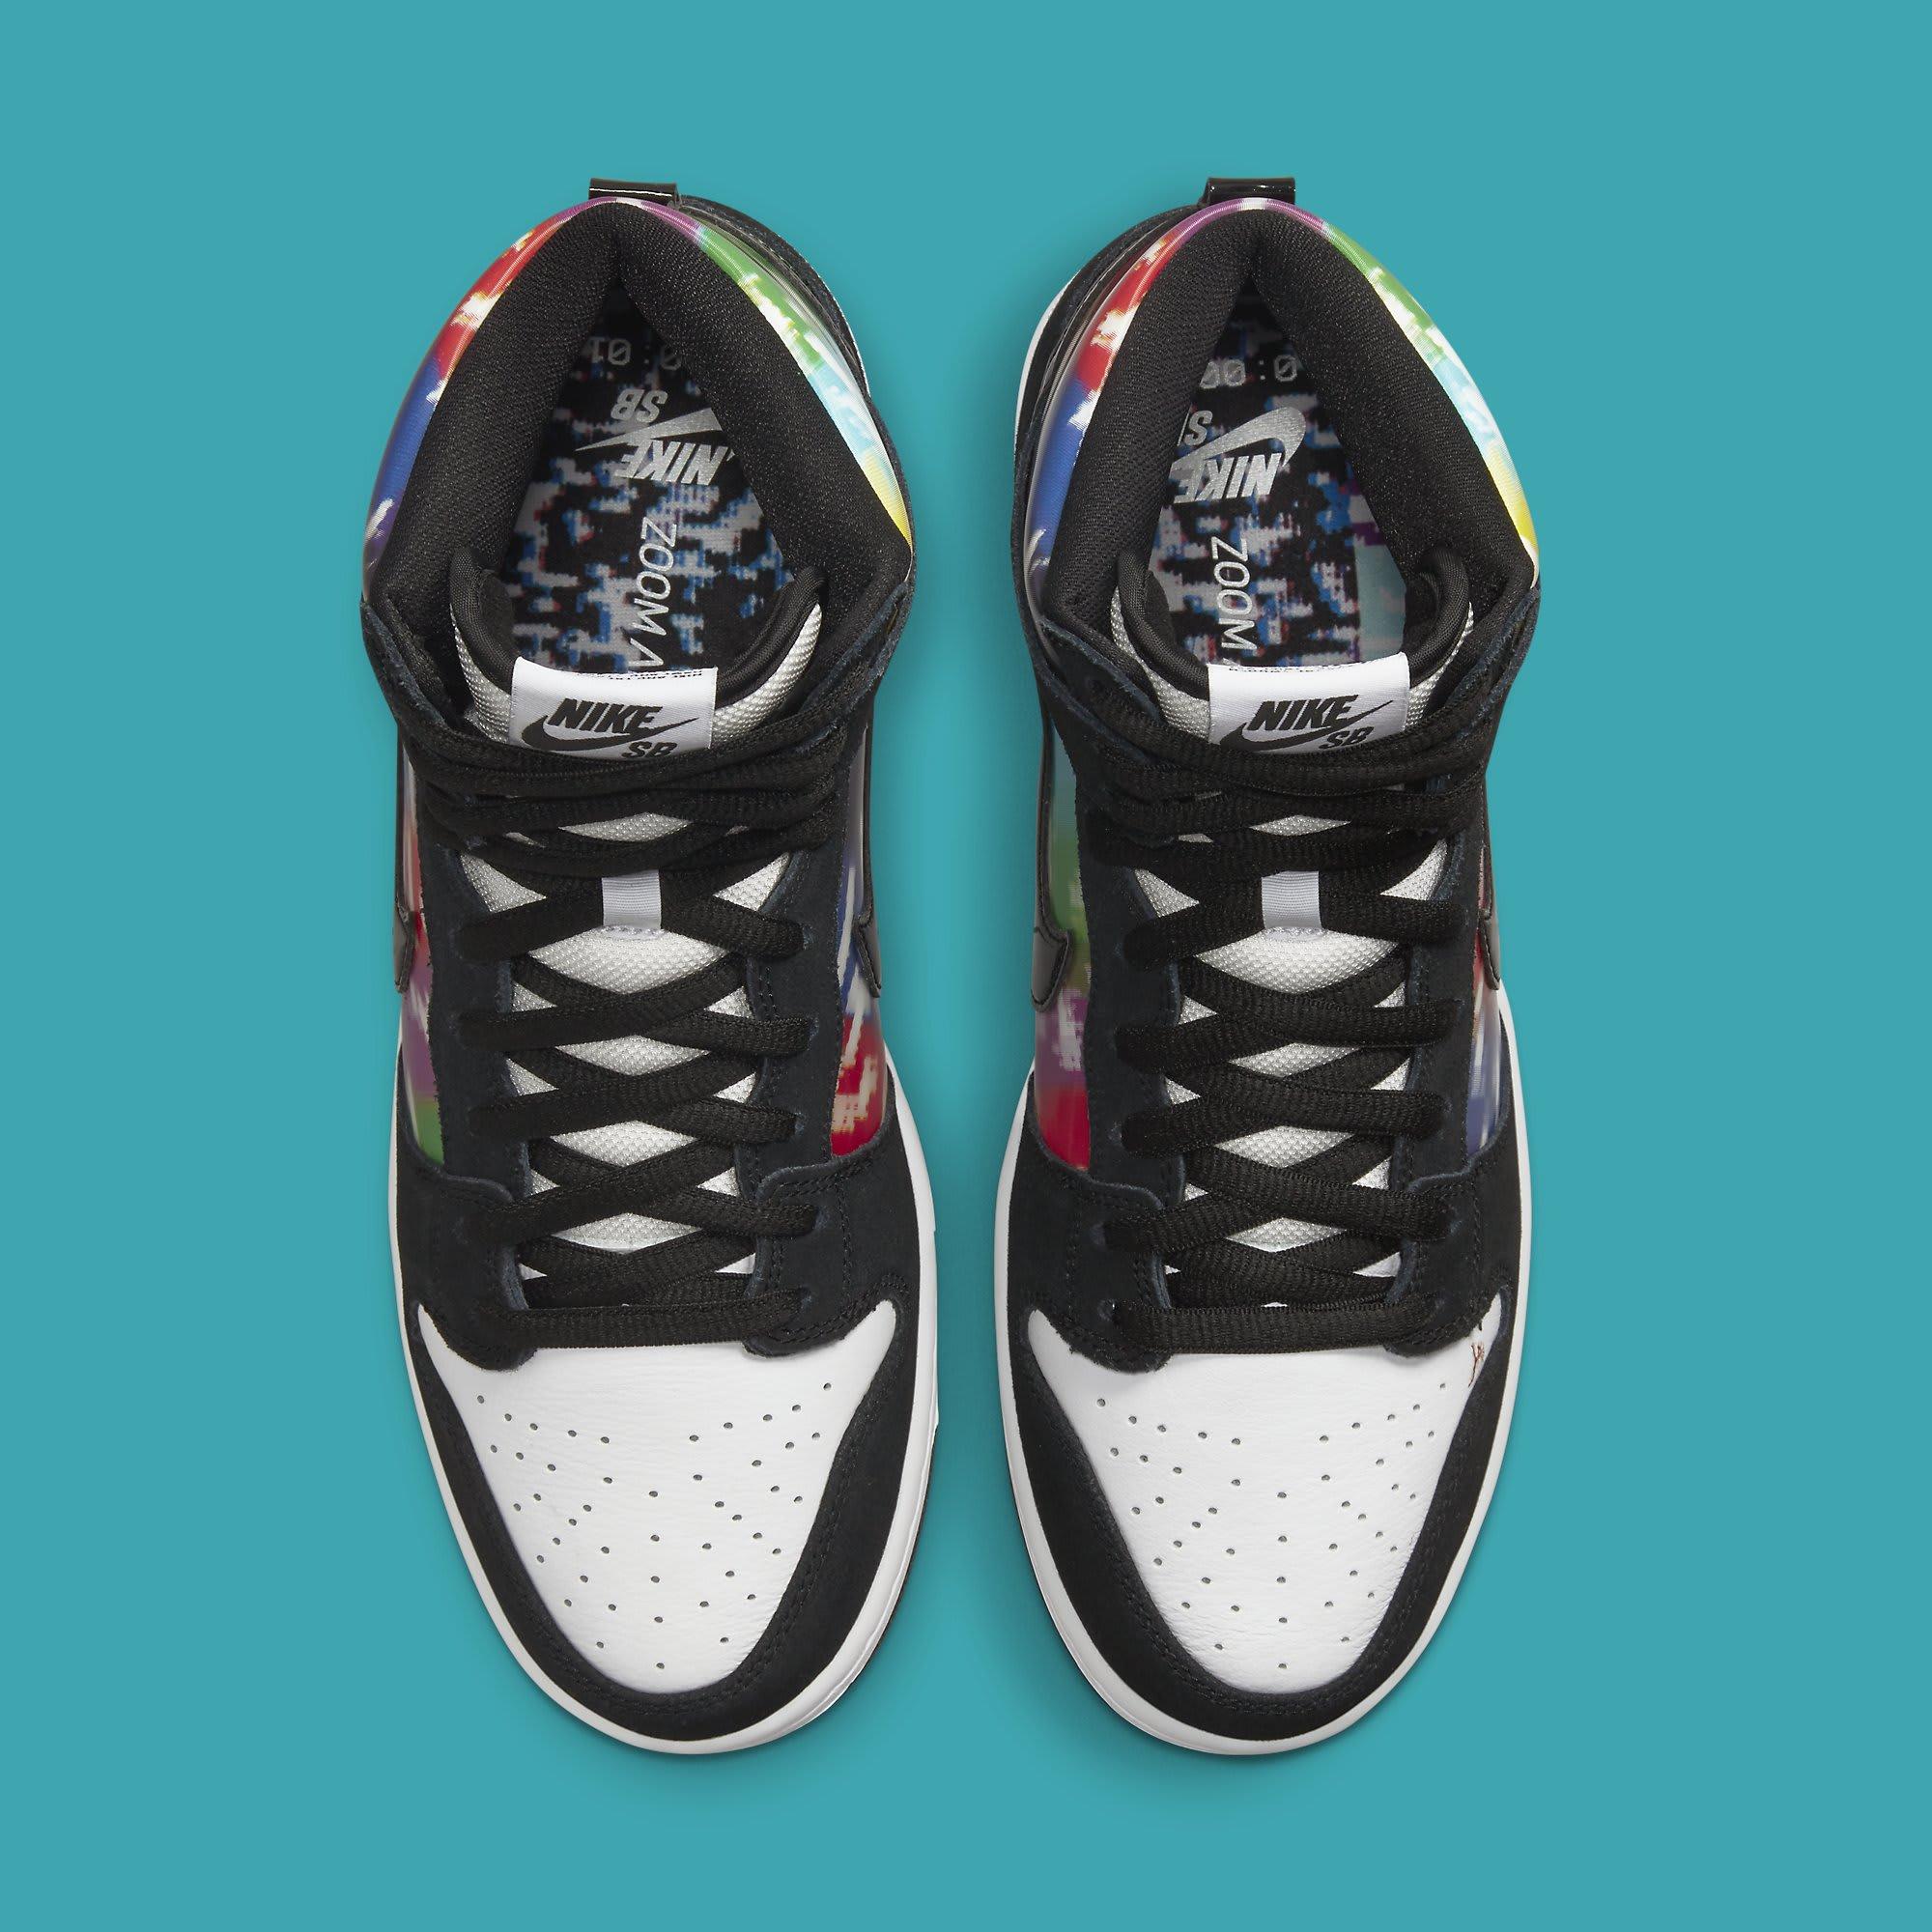 Nike SB Dunk High TV Signal Release Date CZ2253-100 Top